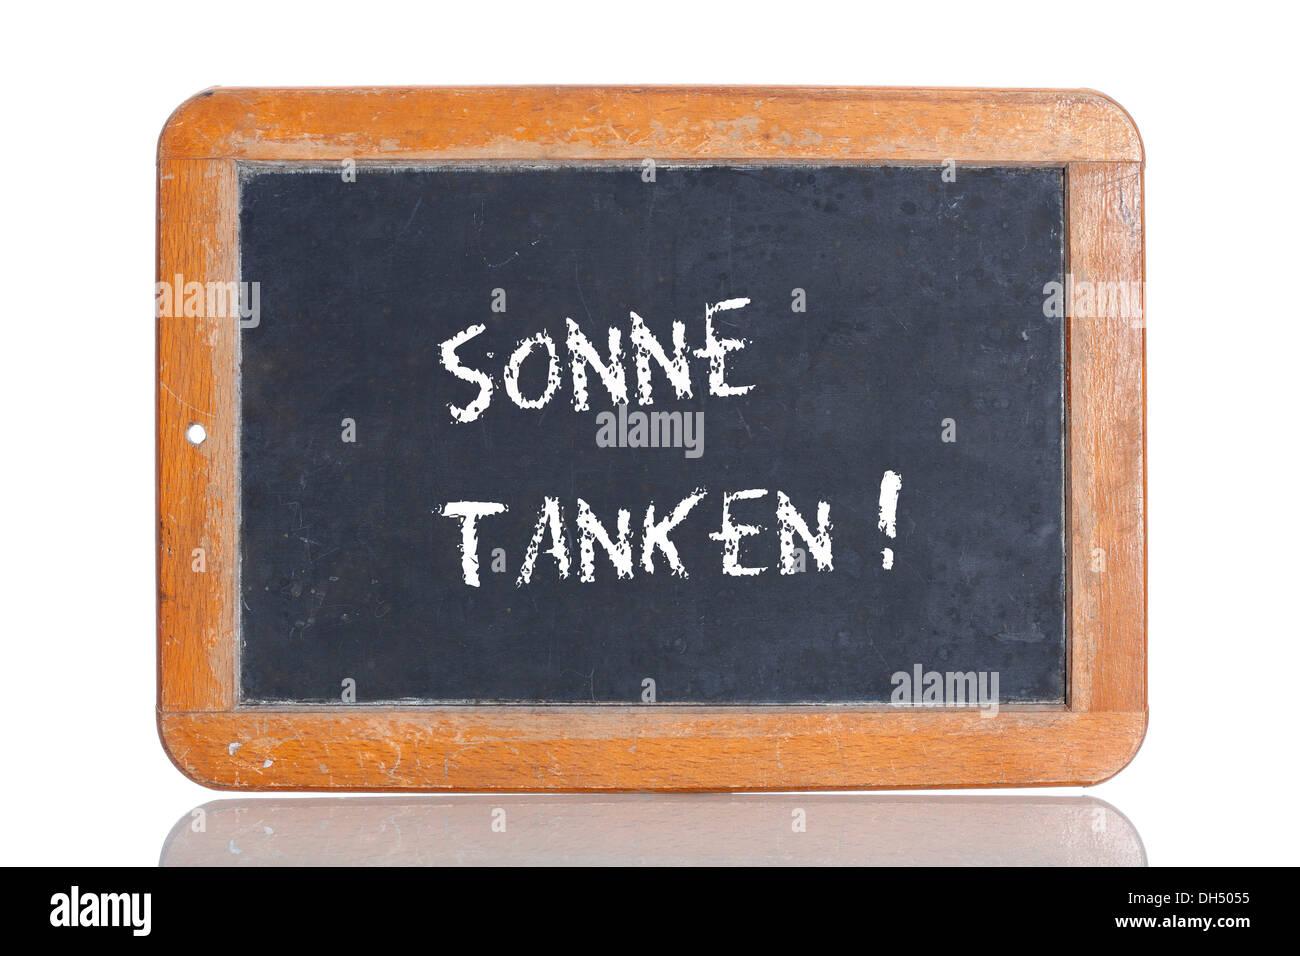 Viejo pizarrón, rotulación TANKEN 'SONNE', Alemán para 'OAK ALGUNAS SUN' Imagen De Stock